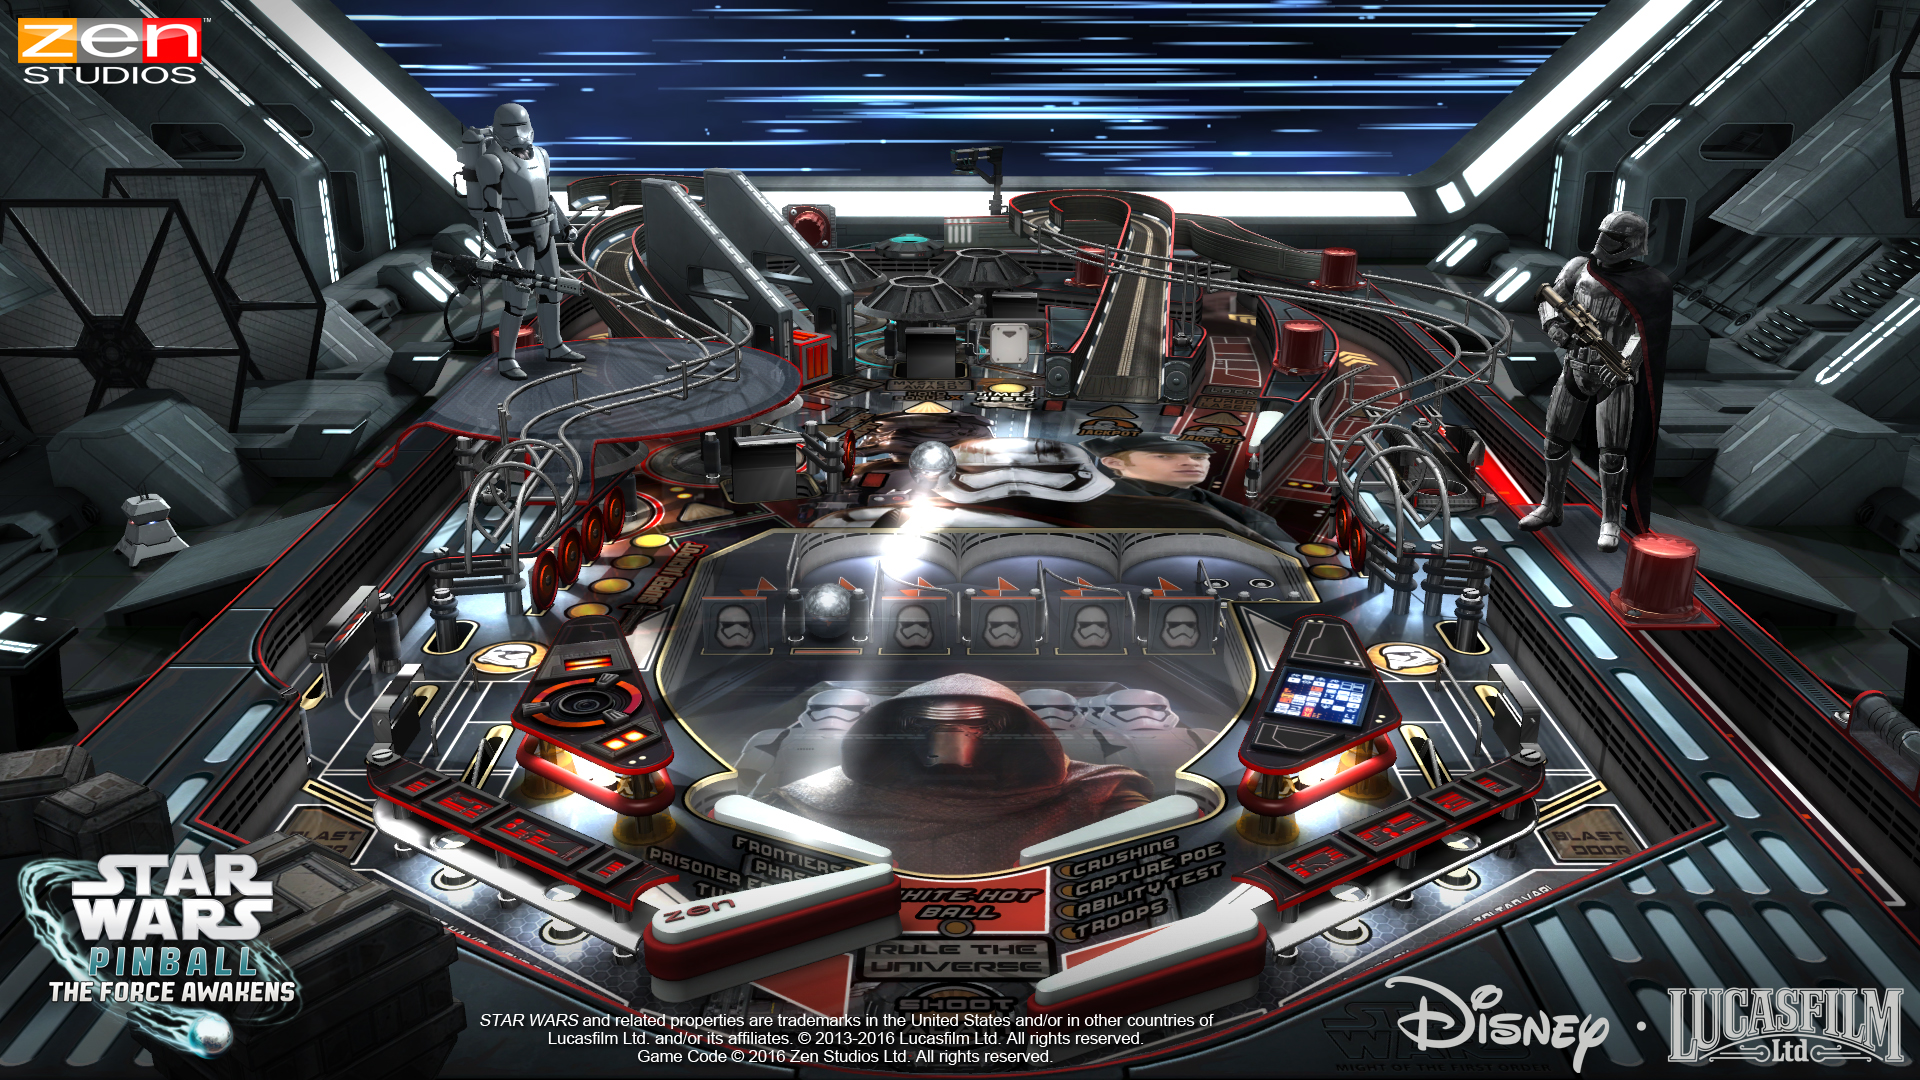 Star Wars Pinball The Force Awakens 2